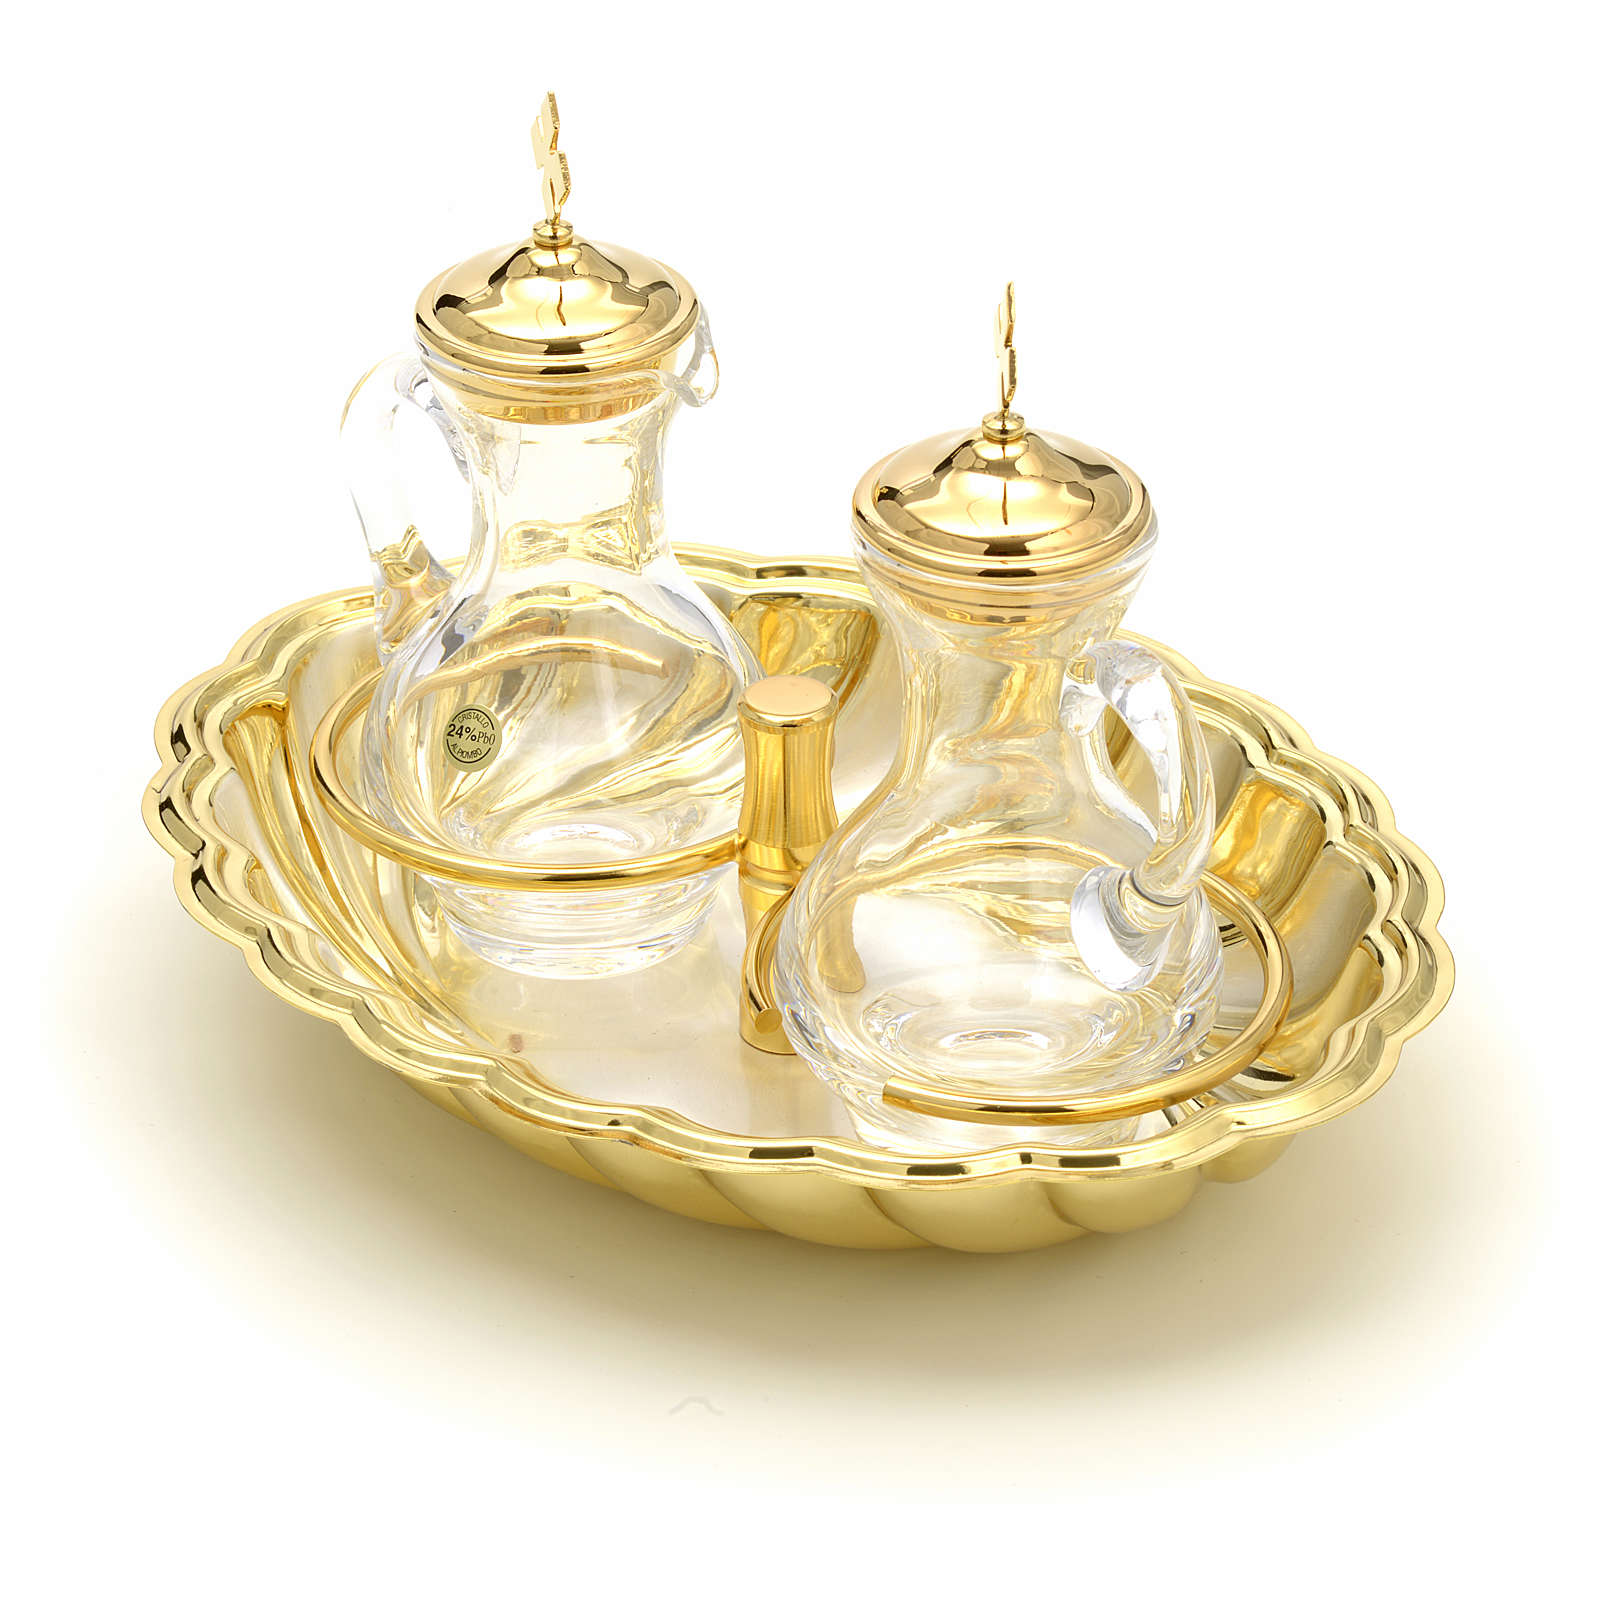 Ampolline vetro vassoio argento e oro 4